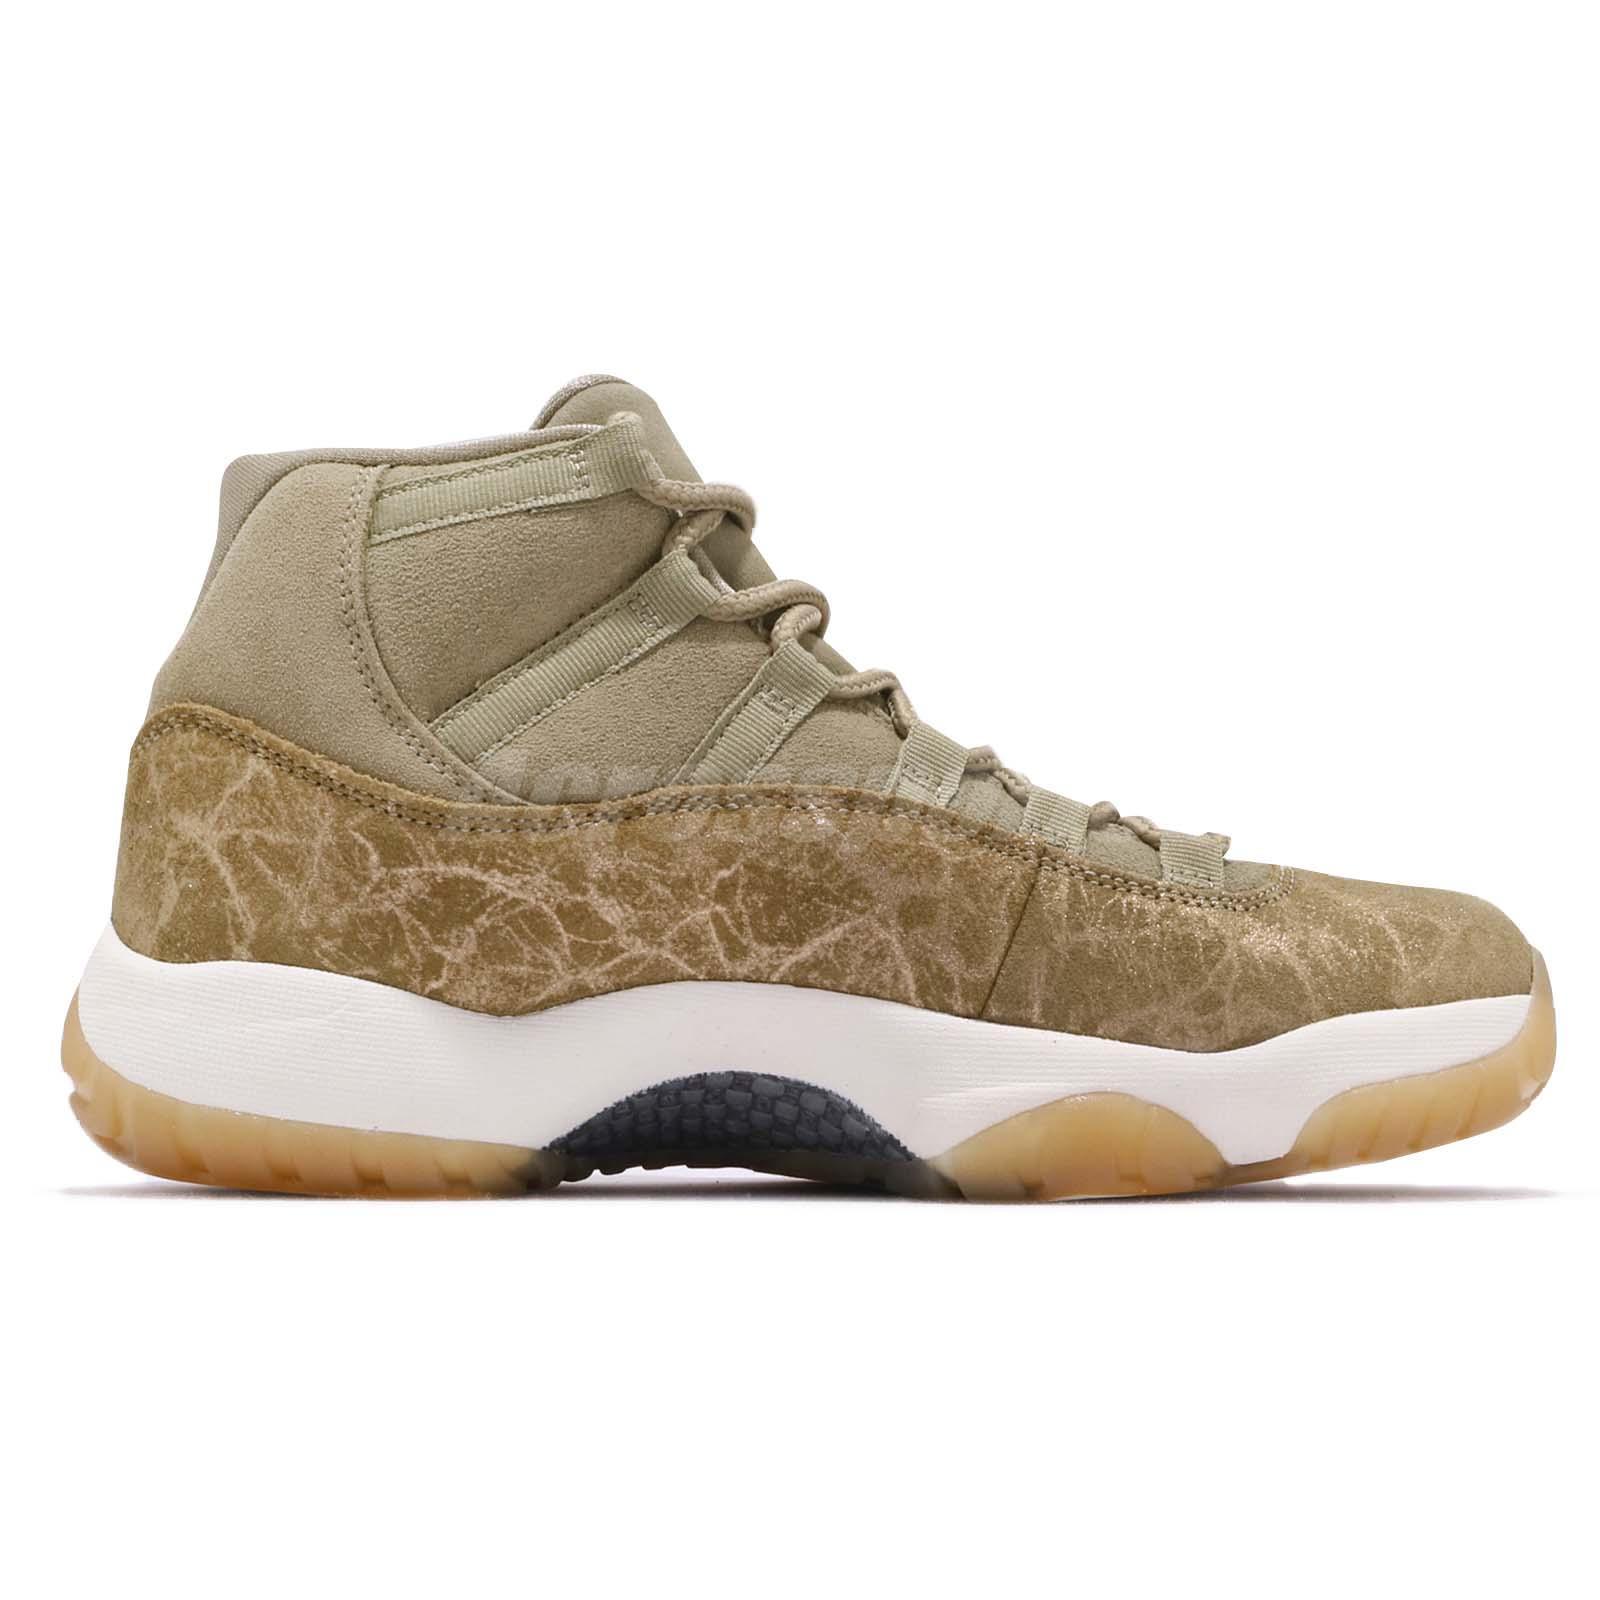 0757af7478a599 Nike Wmns Air Jordan 11 Retro XI Neutral Olive Womens Sneakers AJ11 ...